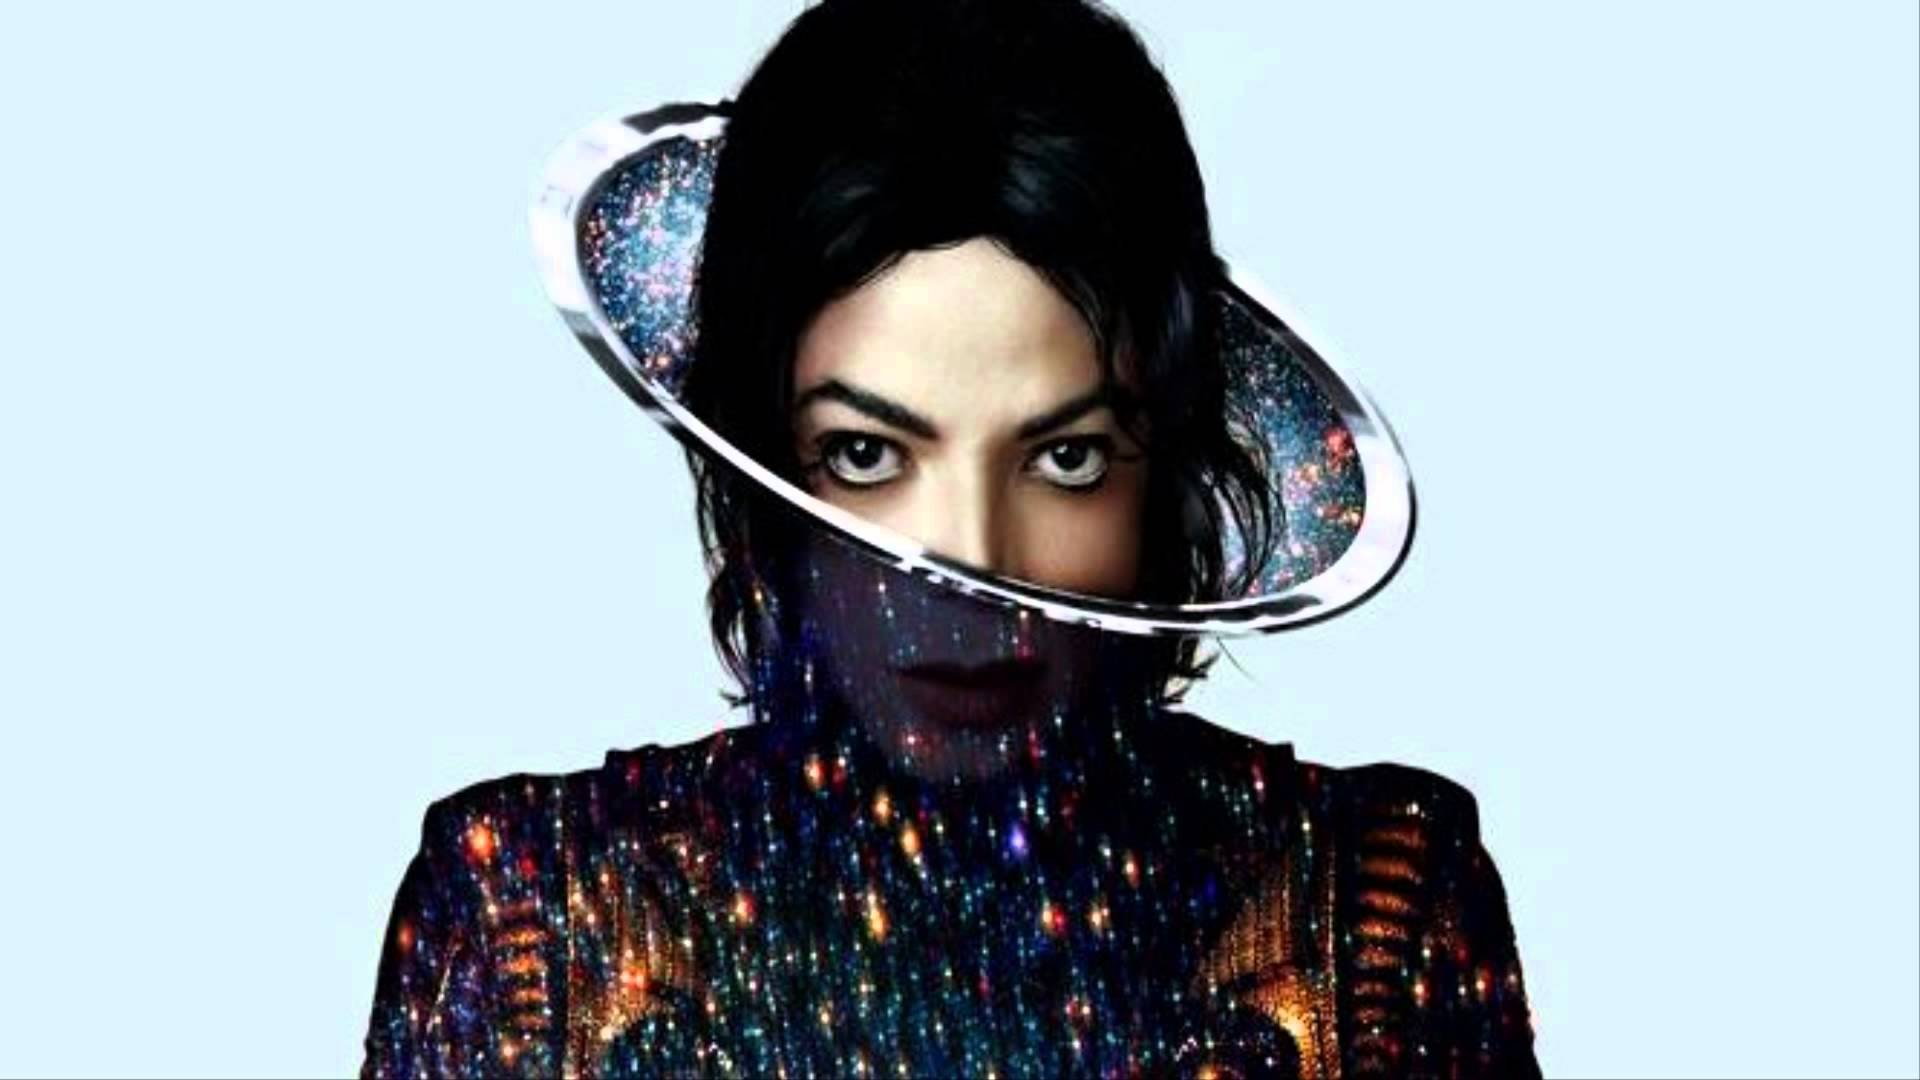 Michael Jackson Bravo Legends Magazine  Posters sept. 2008